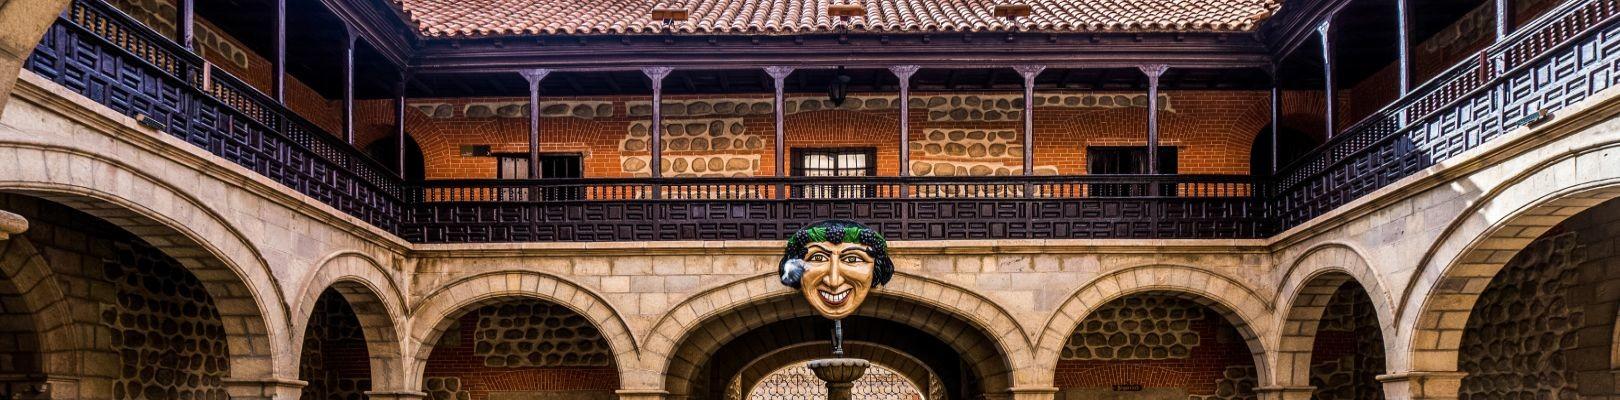 Potosi_Casa_de_la_Moneda_banner-e1410562382896